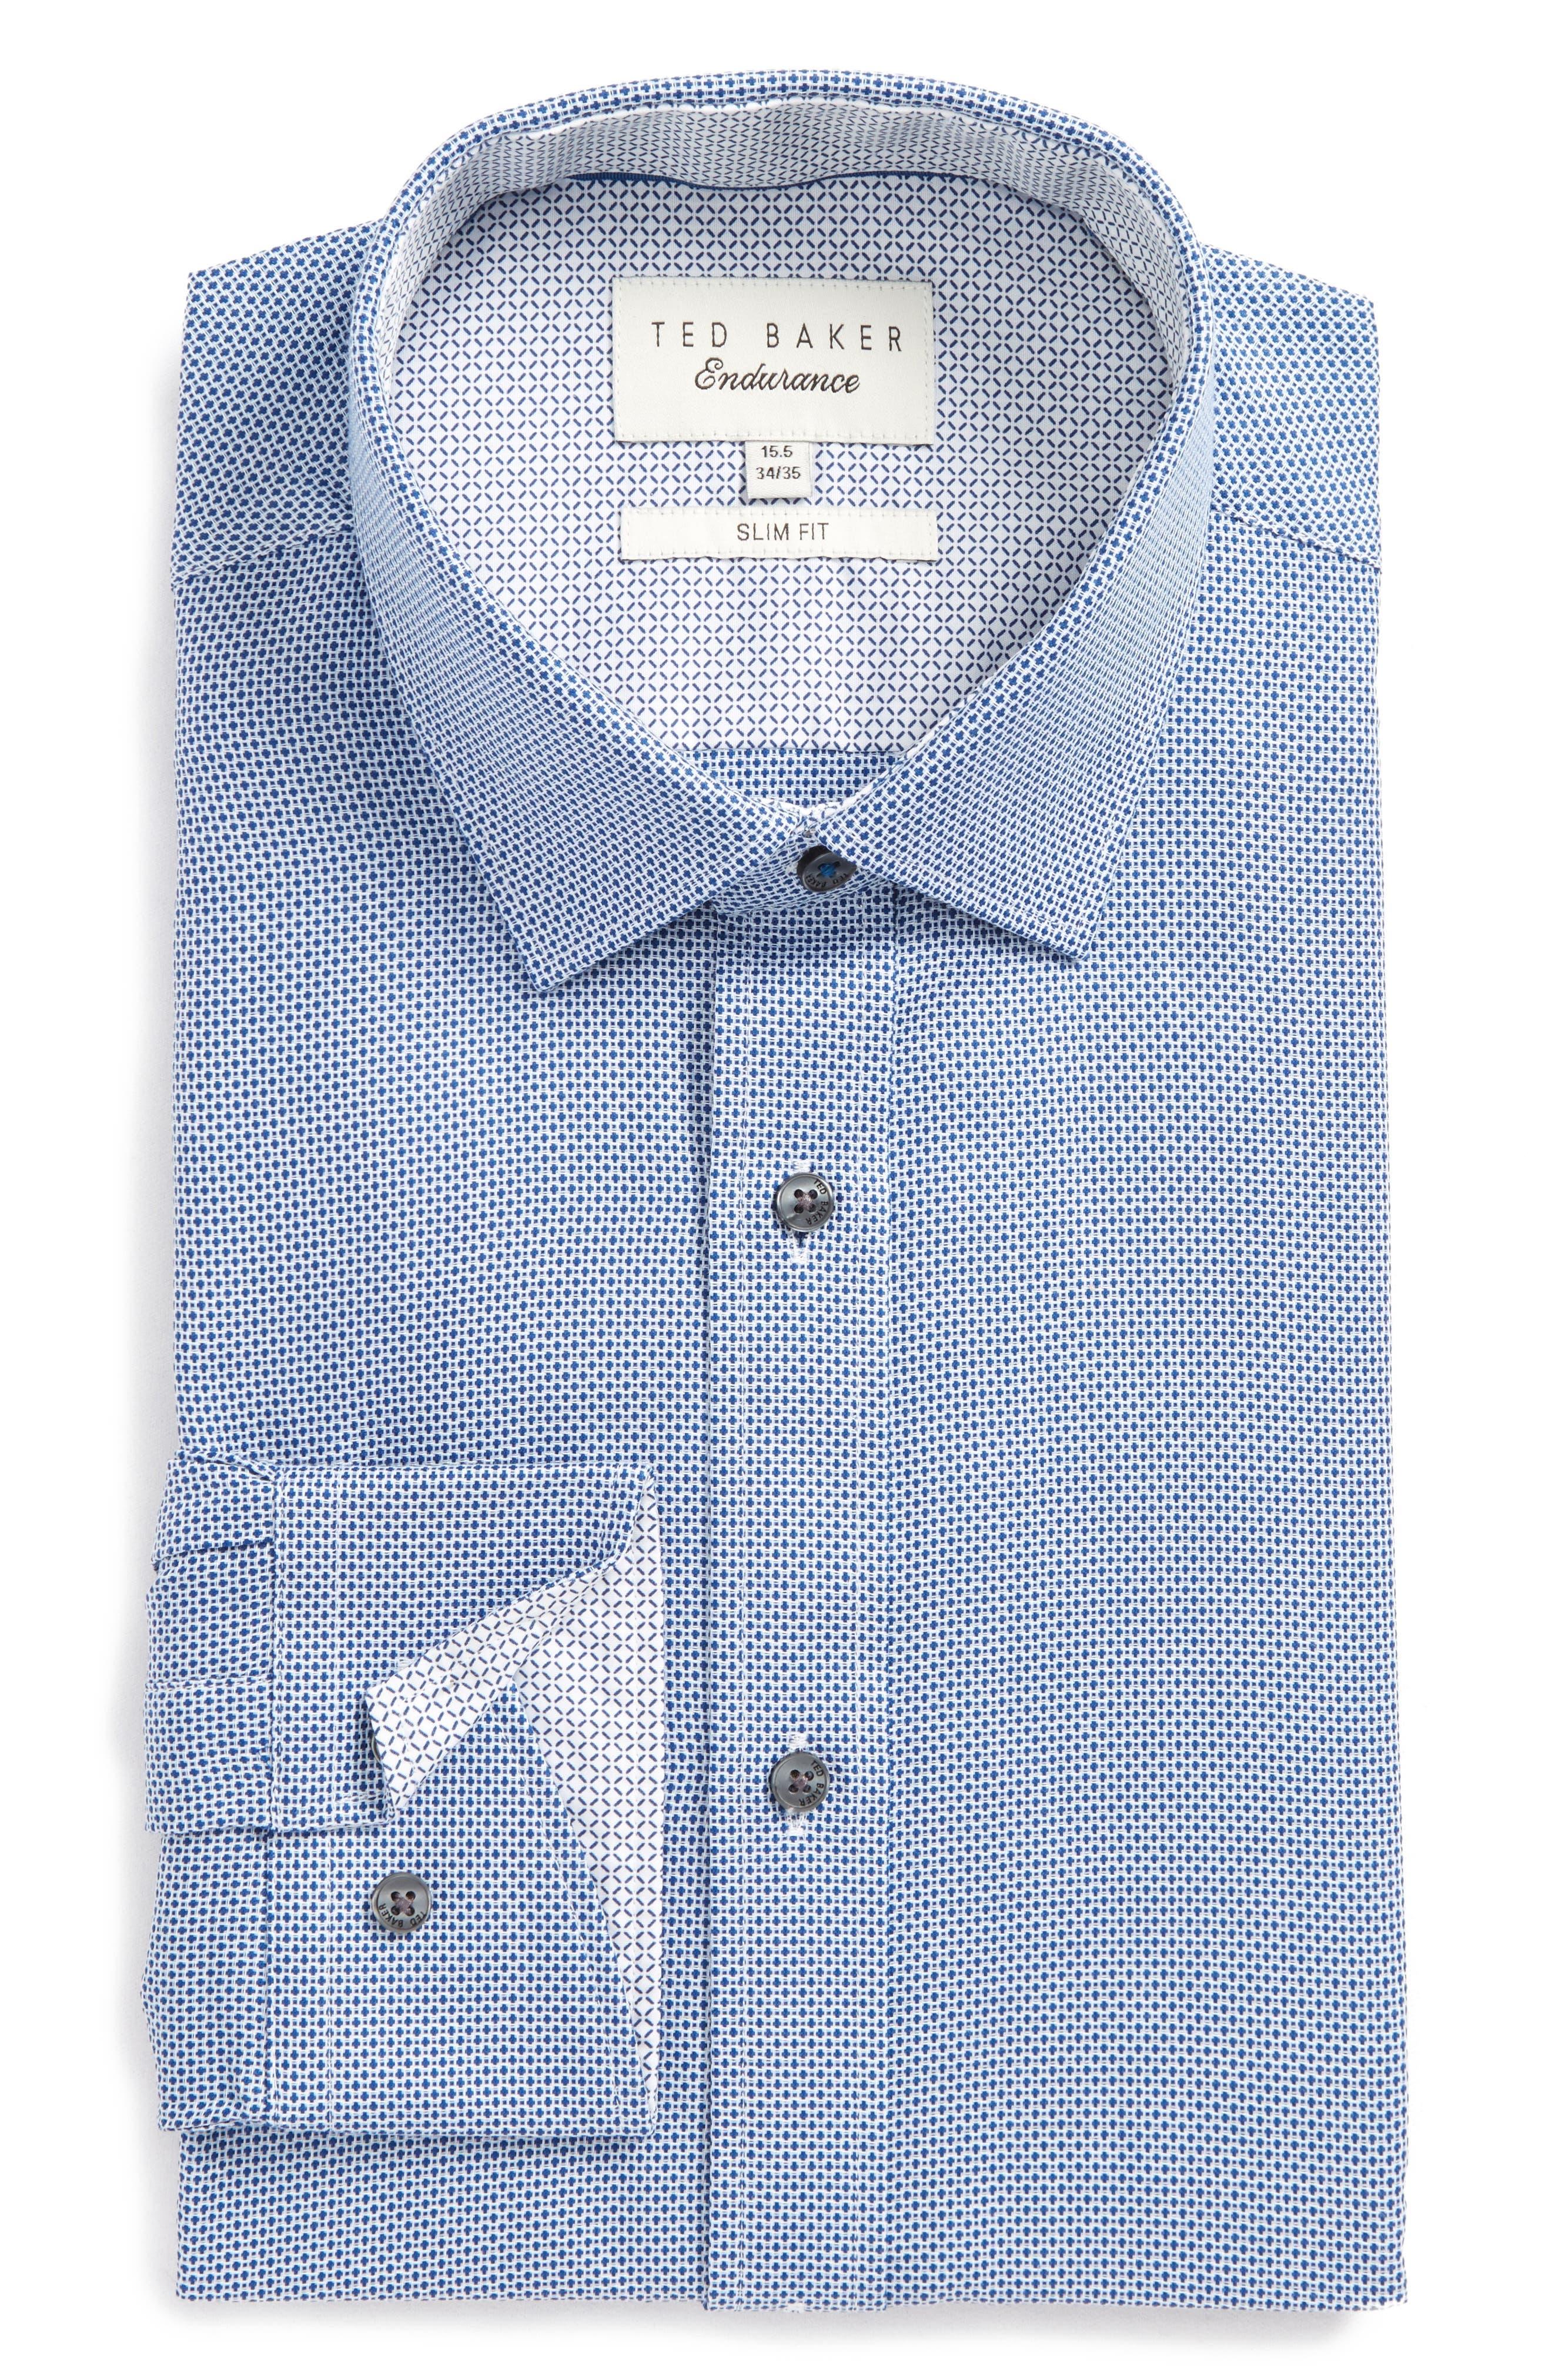 Main Image - Ted Baker London Slim Fit Geometric Dress Shirt